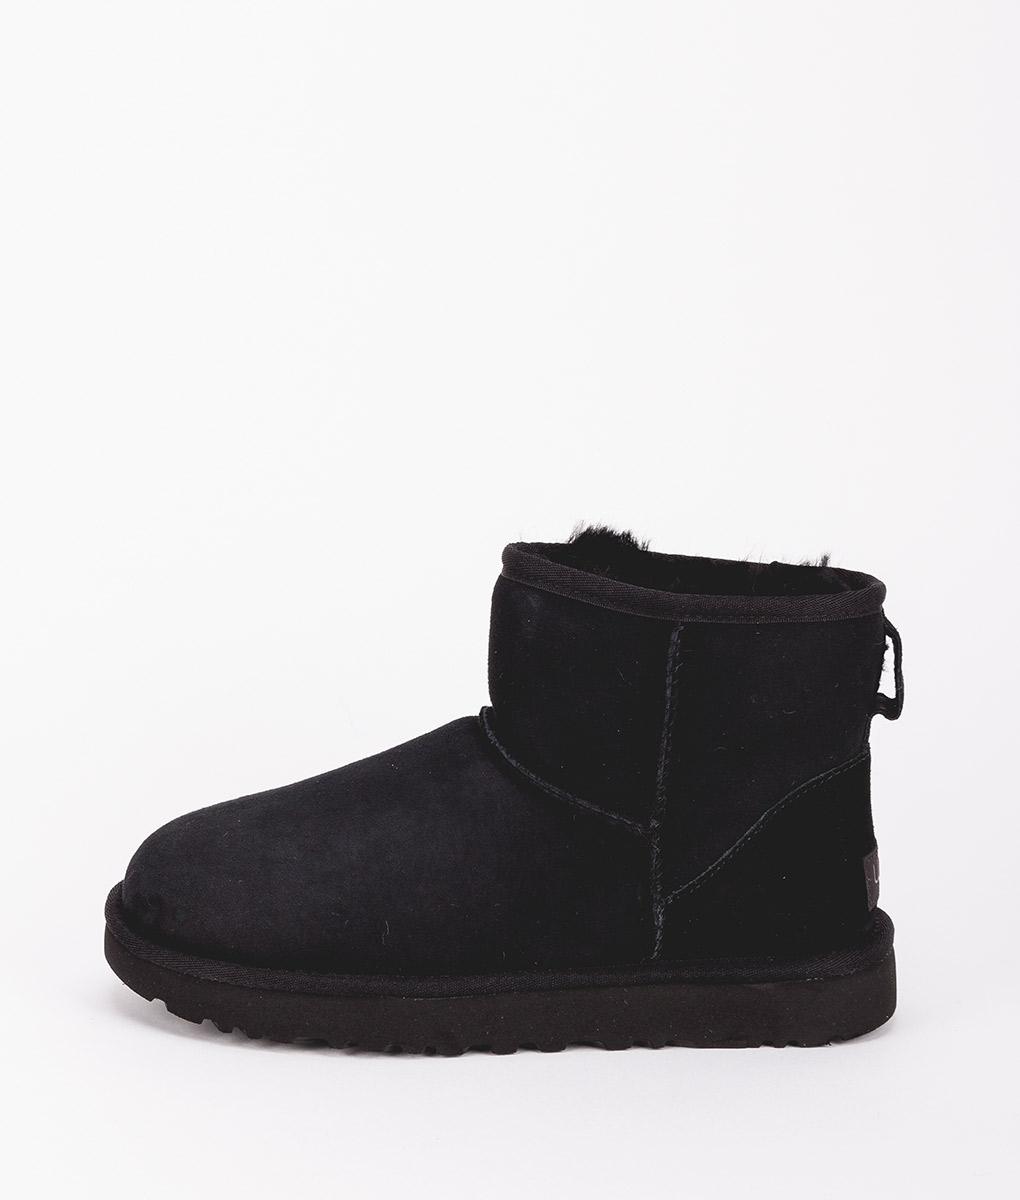 UGG Women Ankle Boots 1016222 CLASSIC MINI II, Black